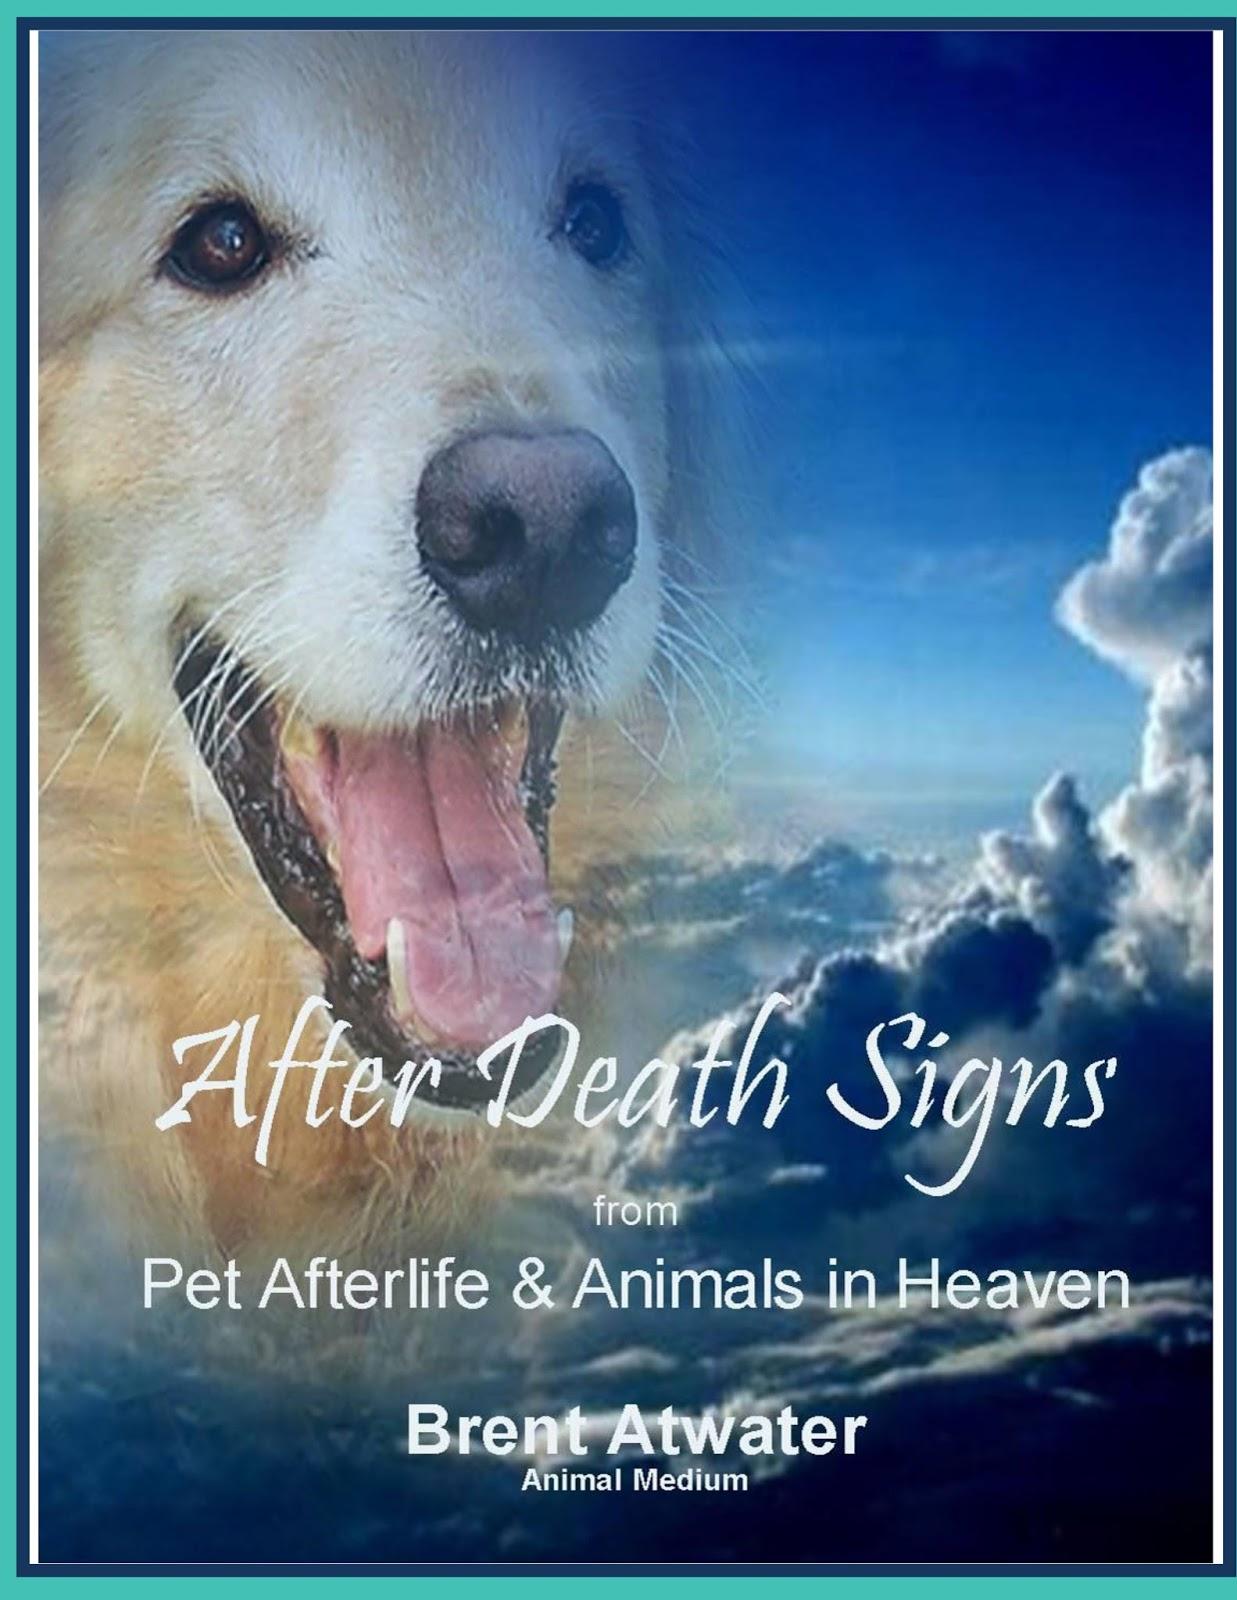 Movie About A Dog Reincarnation